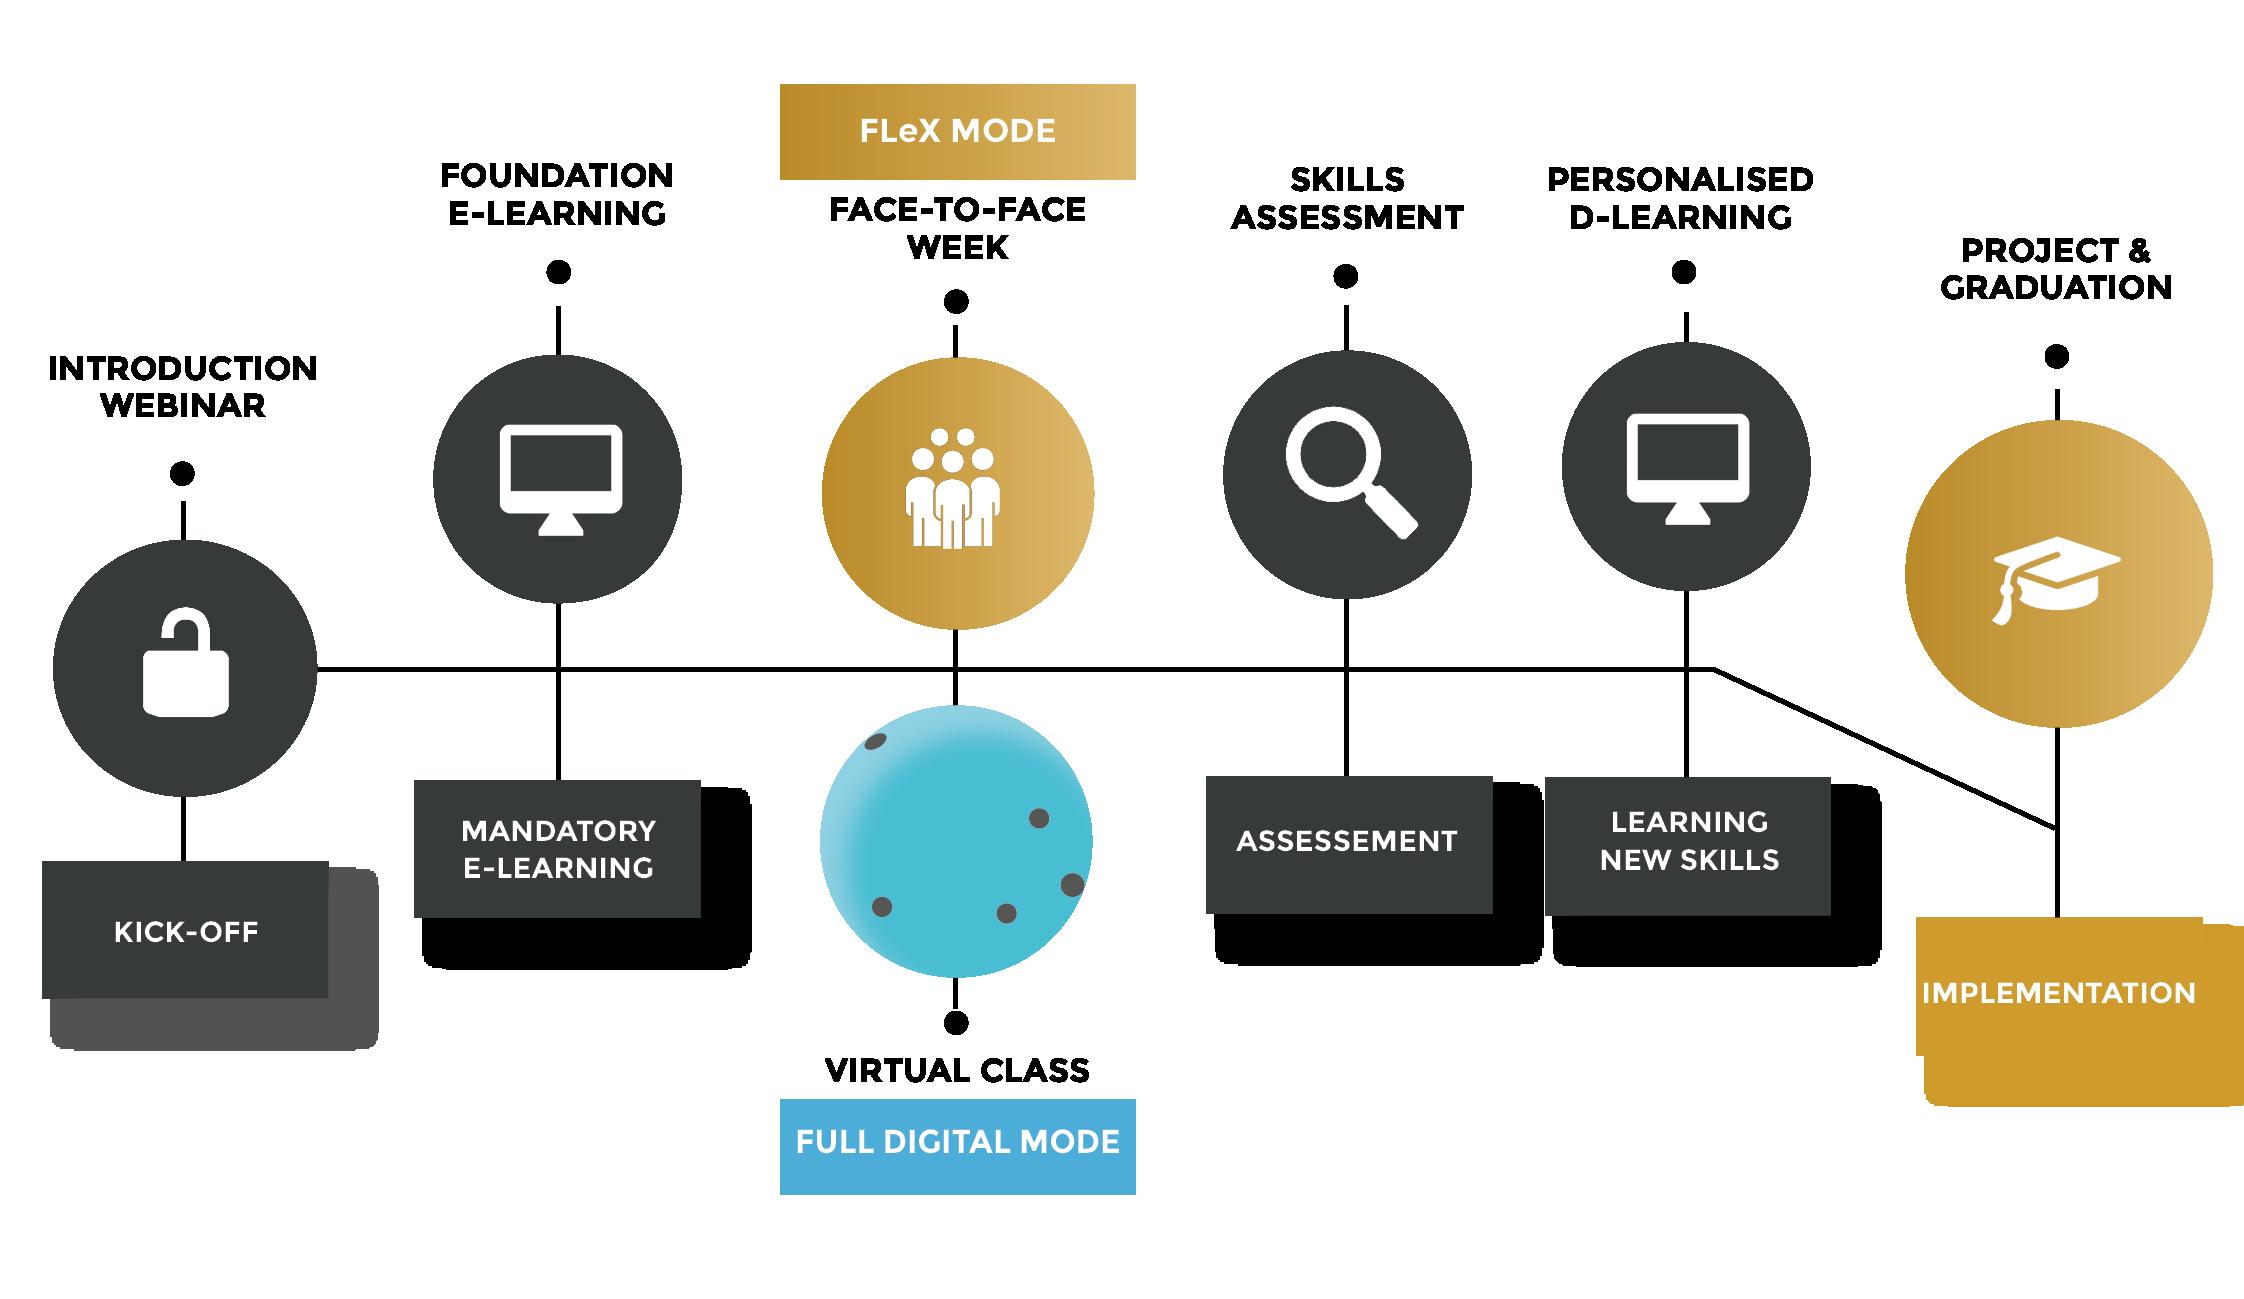 Certifications CatMan and Experts: FLeX Mode et Full Digital Mode